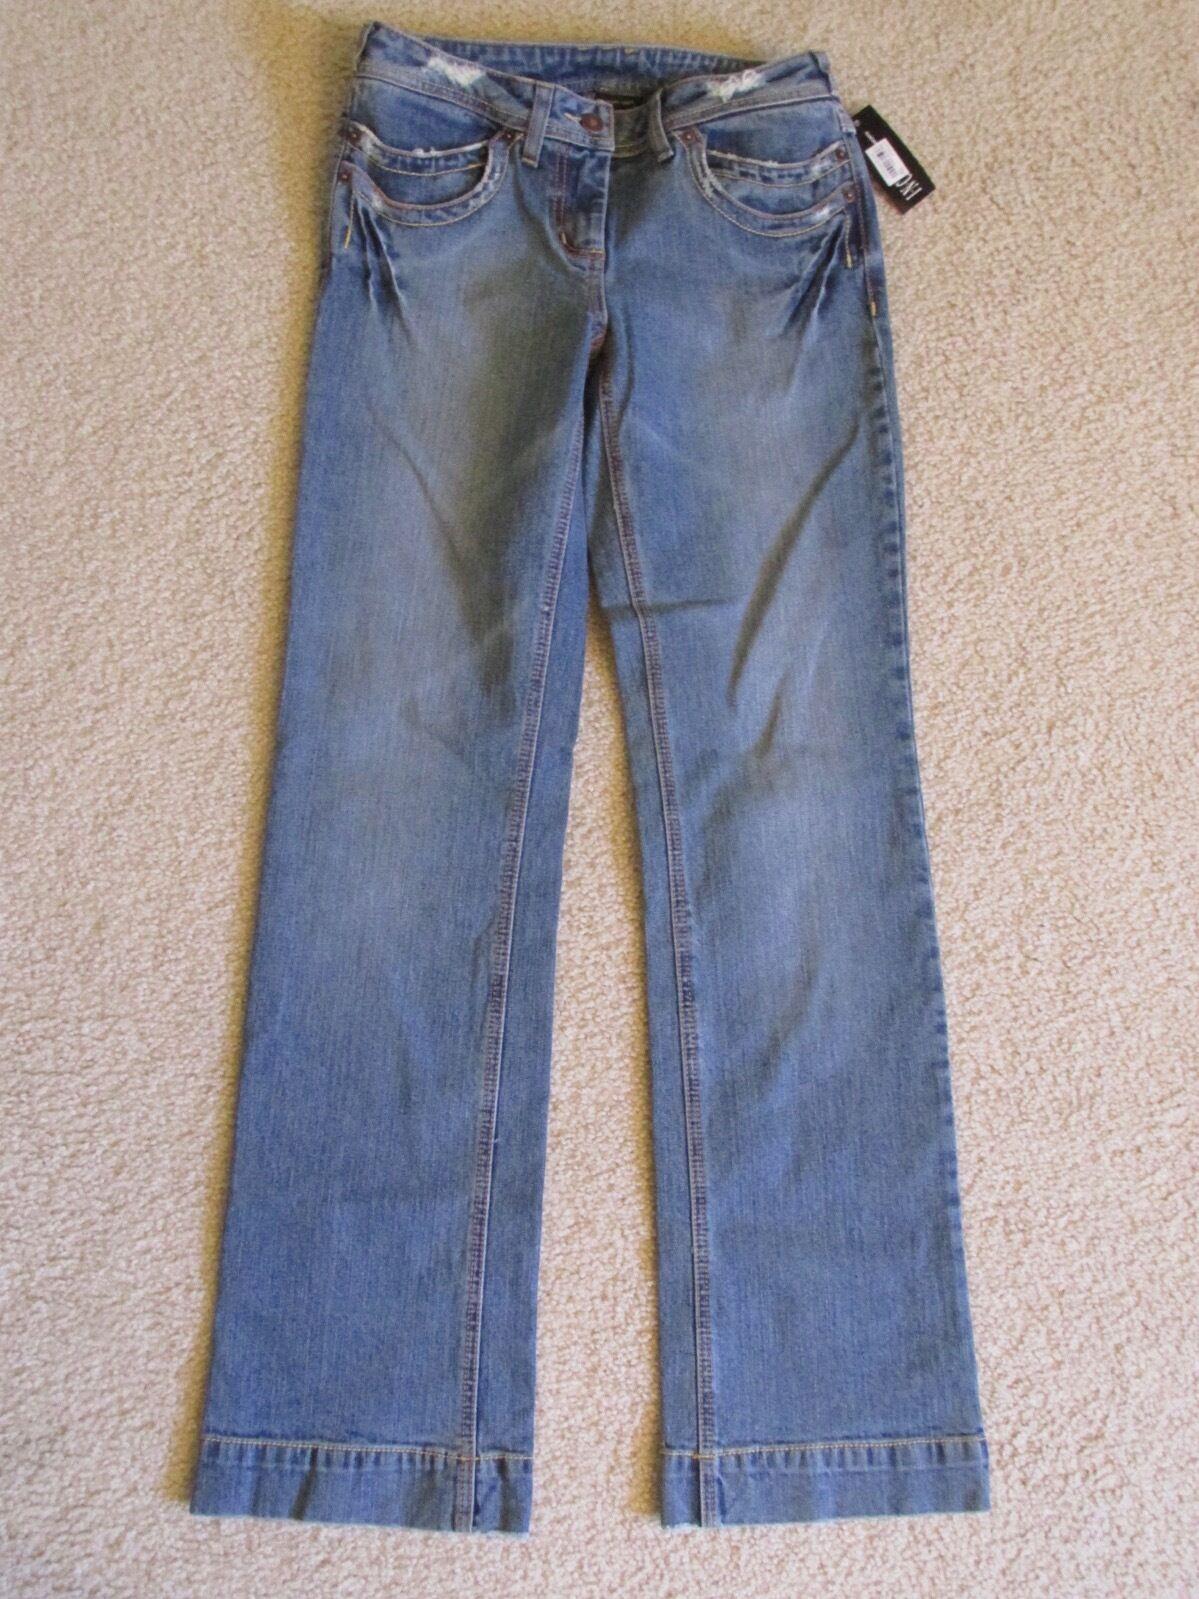 New Women's INC Straight Leg Full Length Distressed bluee Jeans (Pants) Size 2